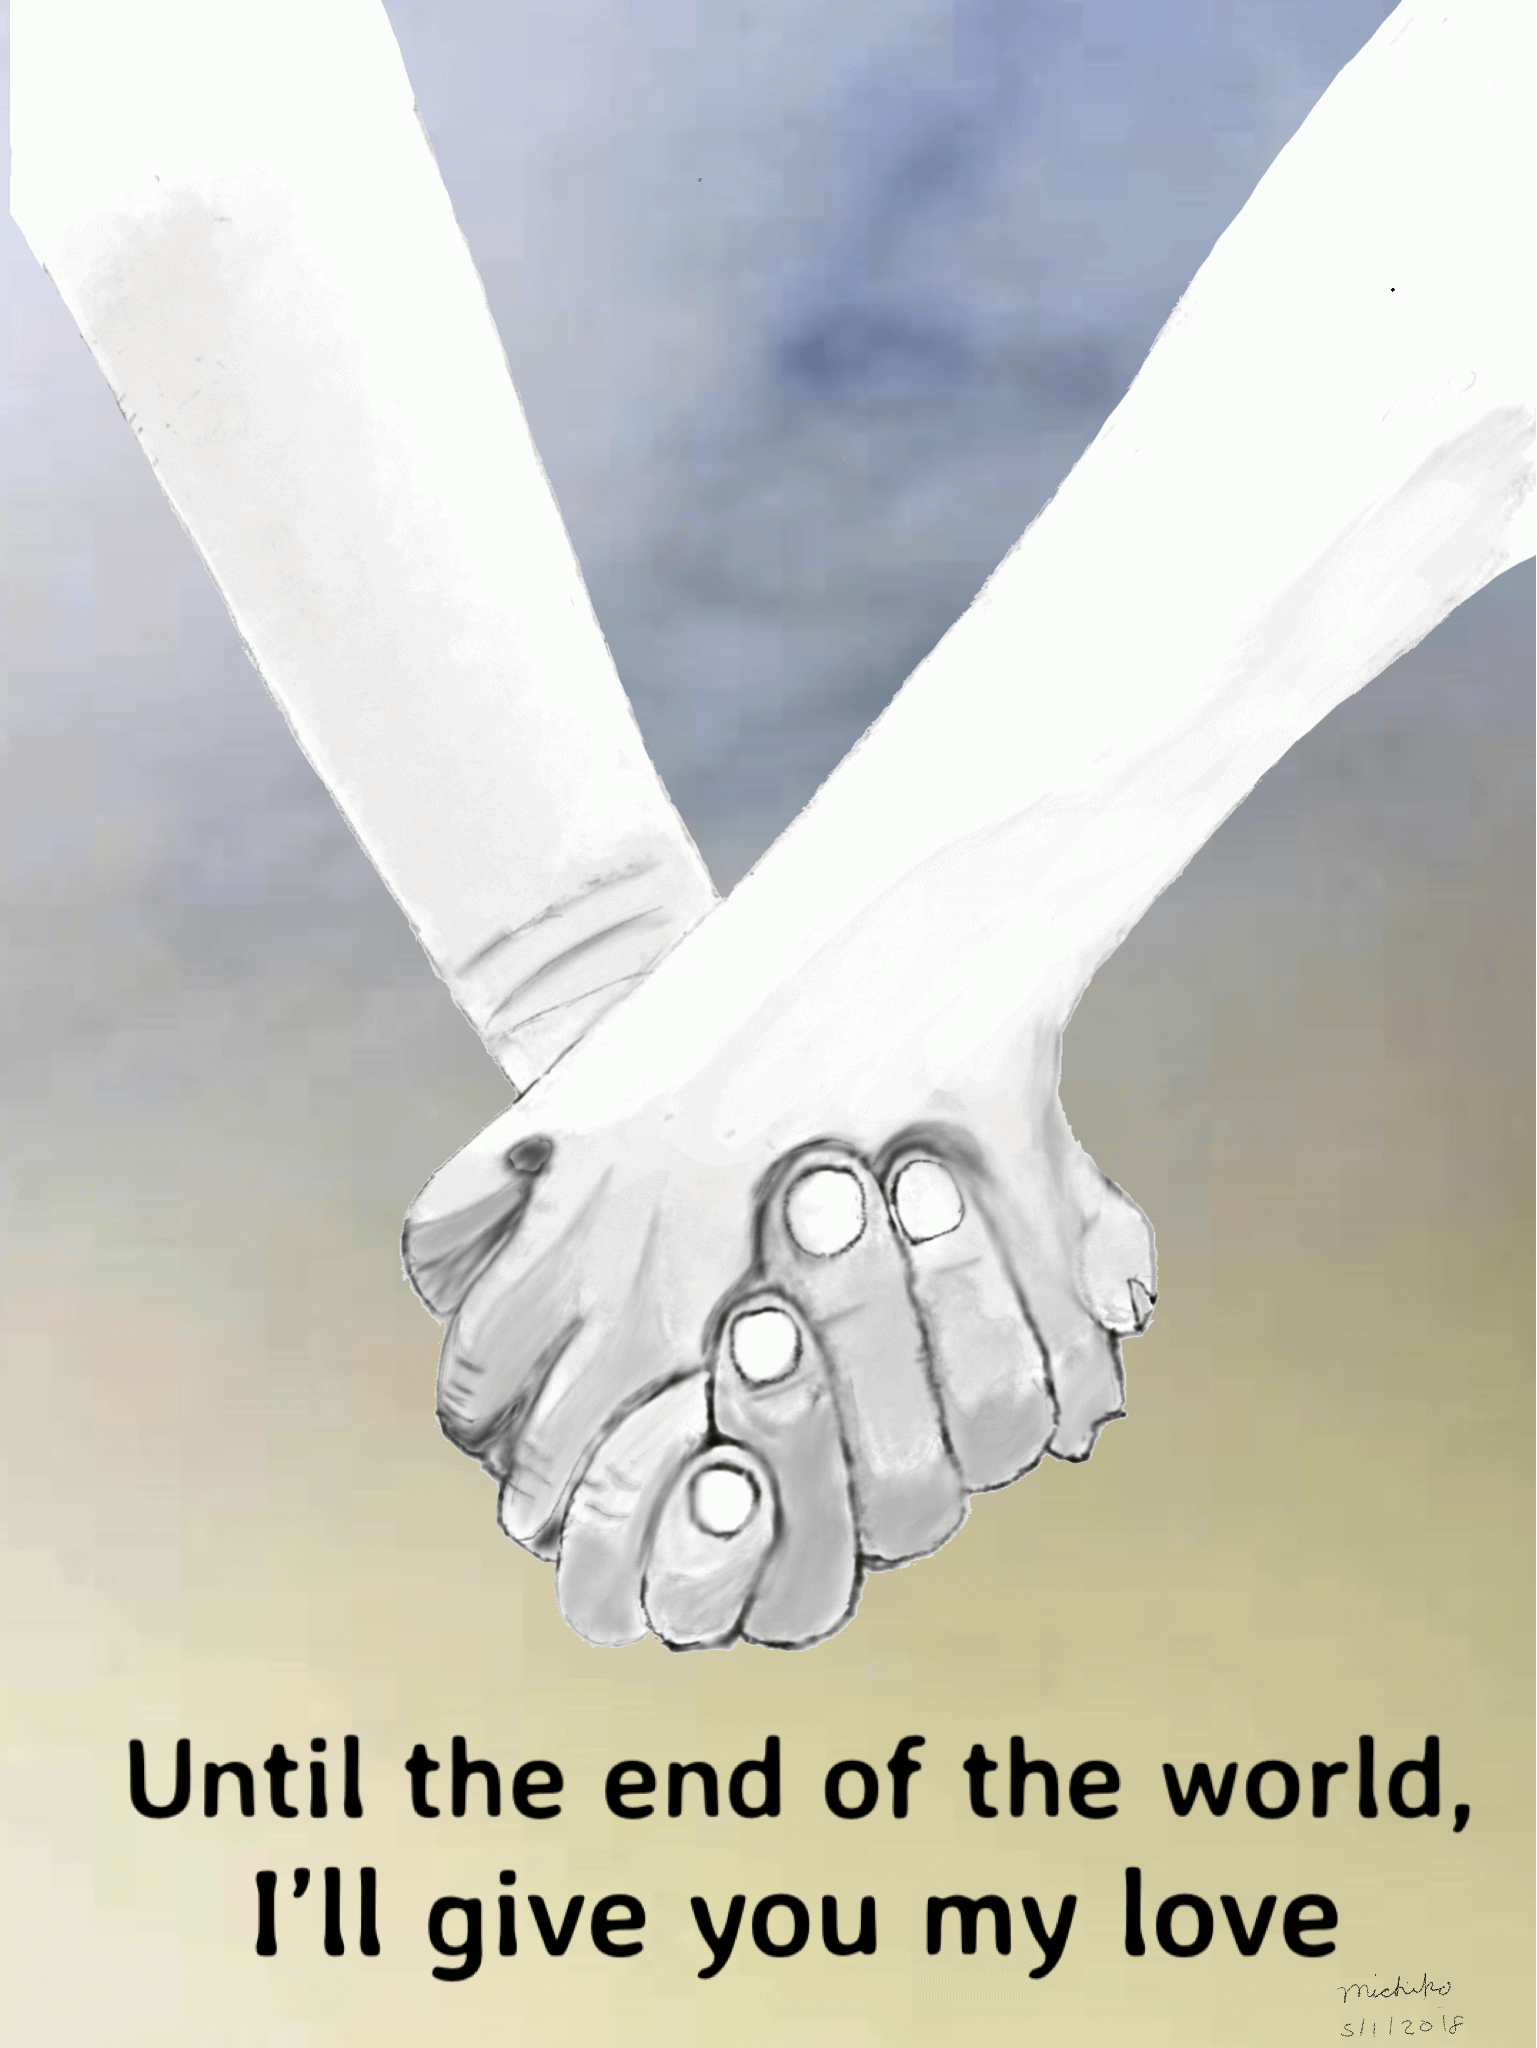 Sketch of holding hands